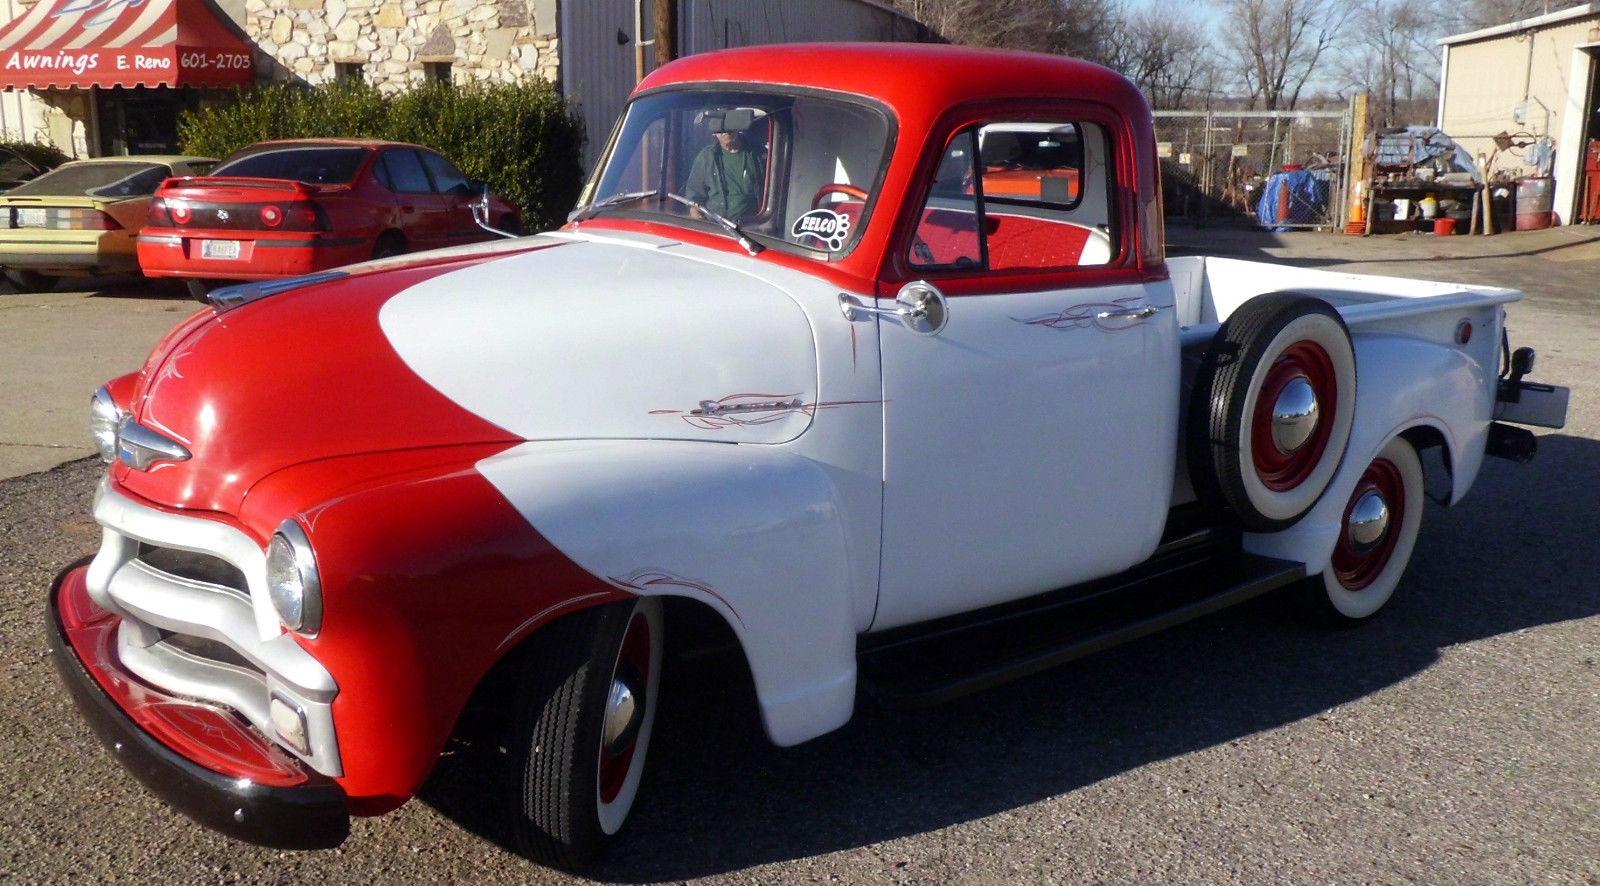 1954 Chevrolet Pickup 3100 Hot Rod Rat Truckita Bomb Classic Chevy Truck Other Pickups